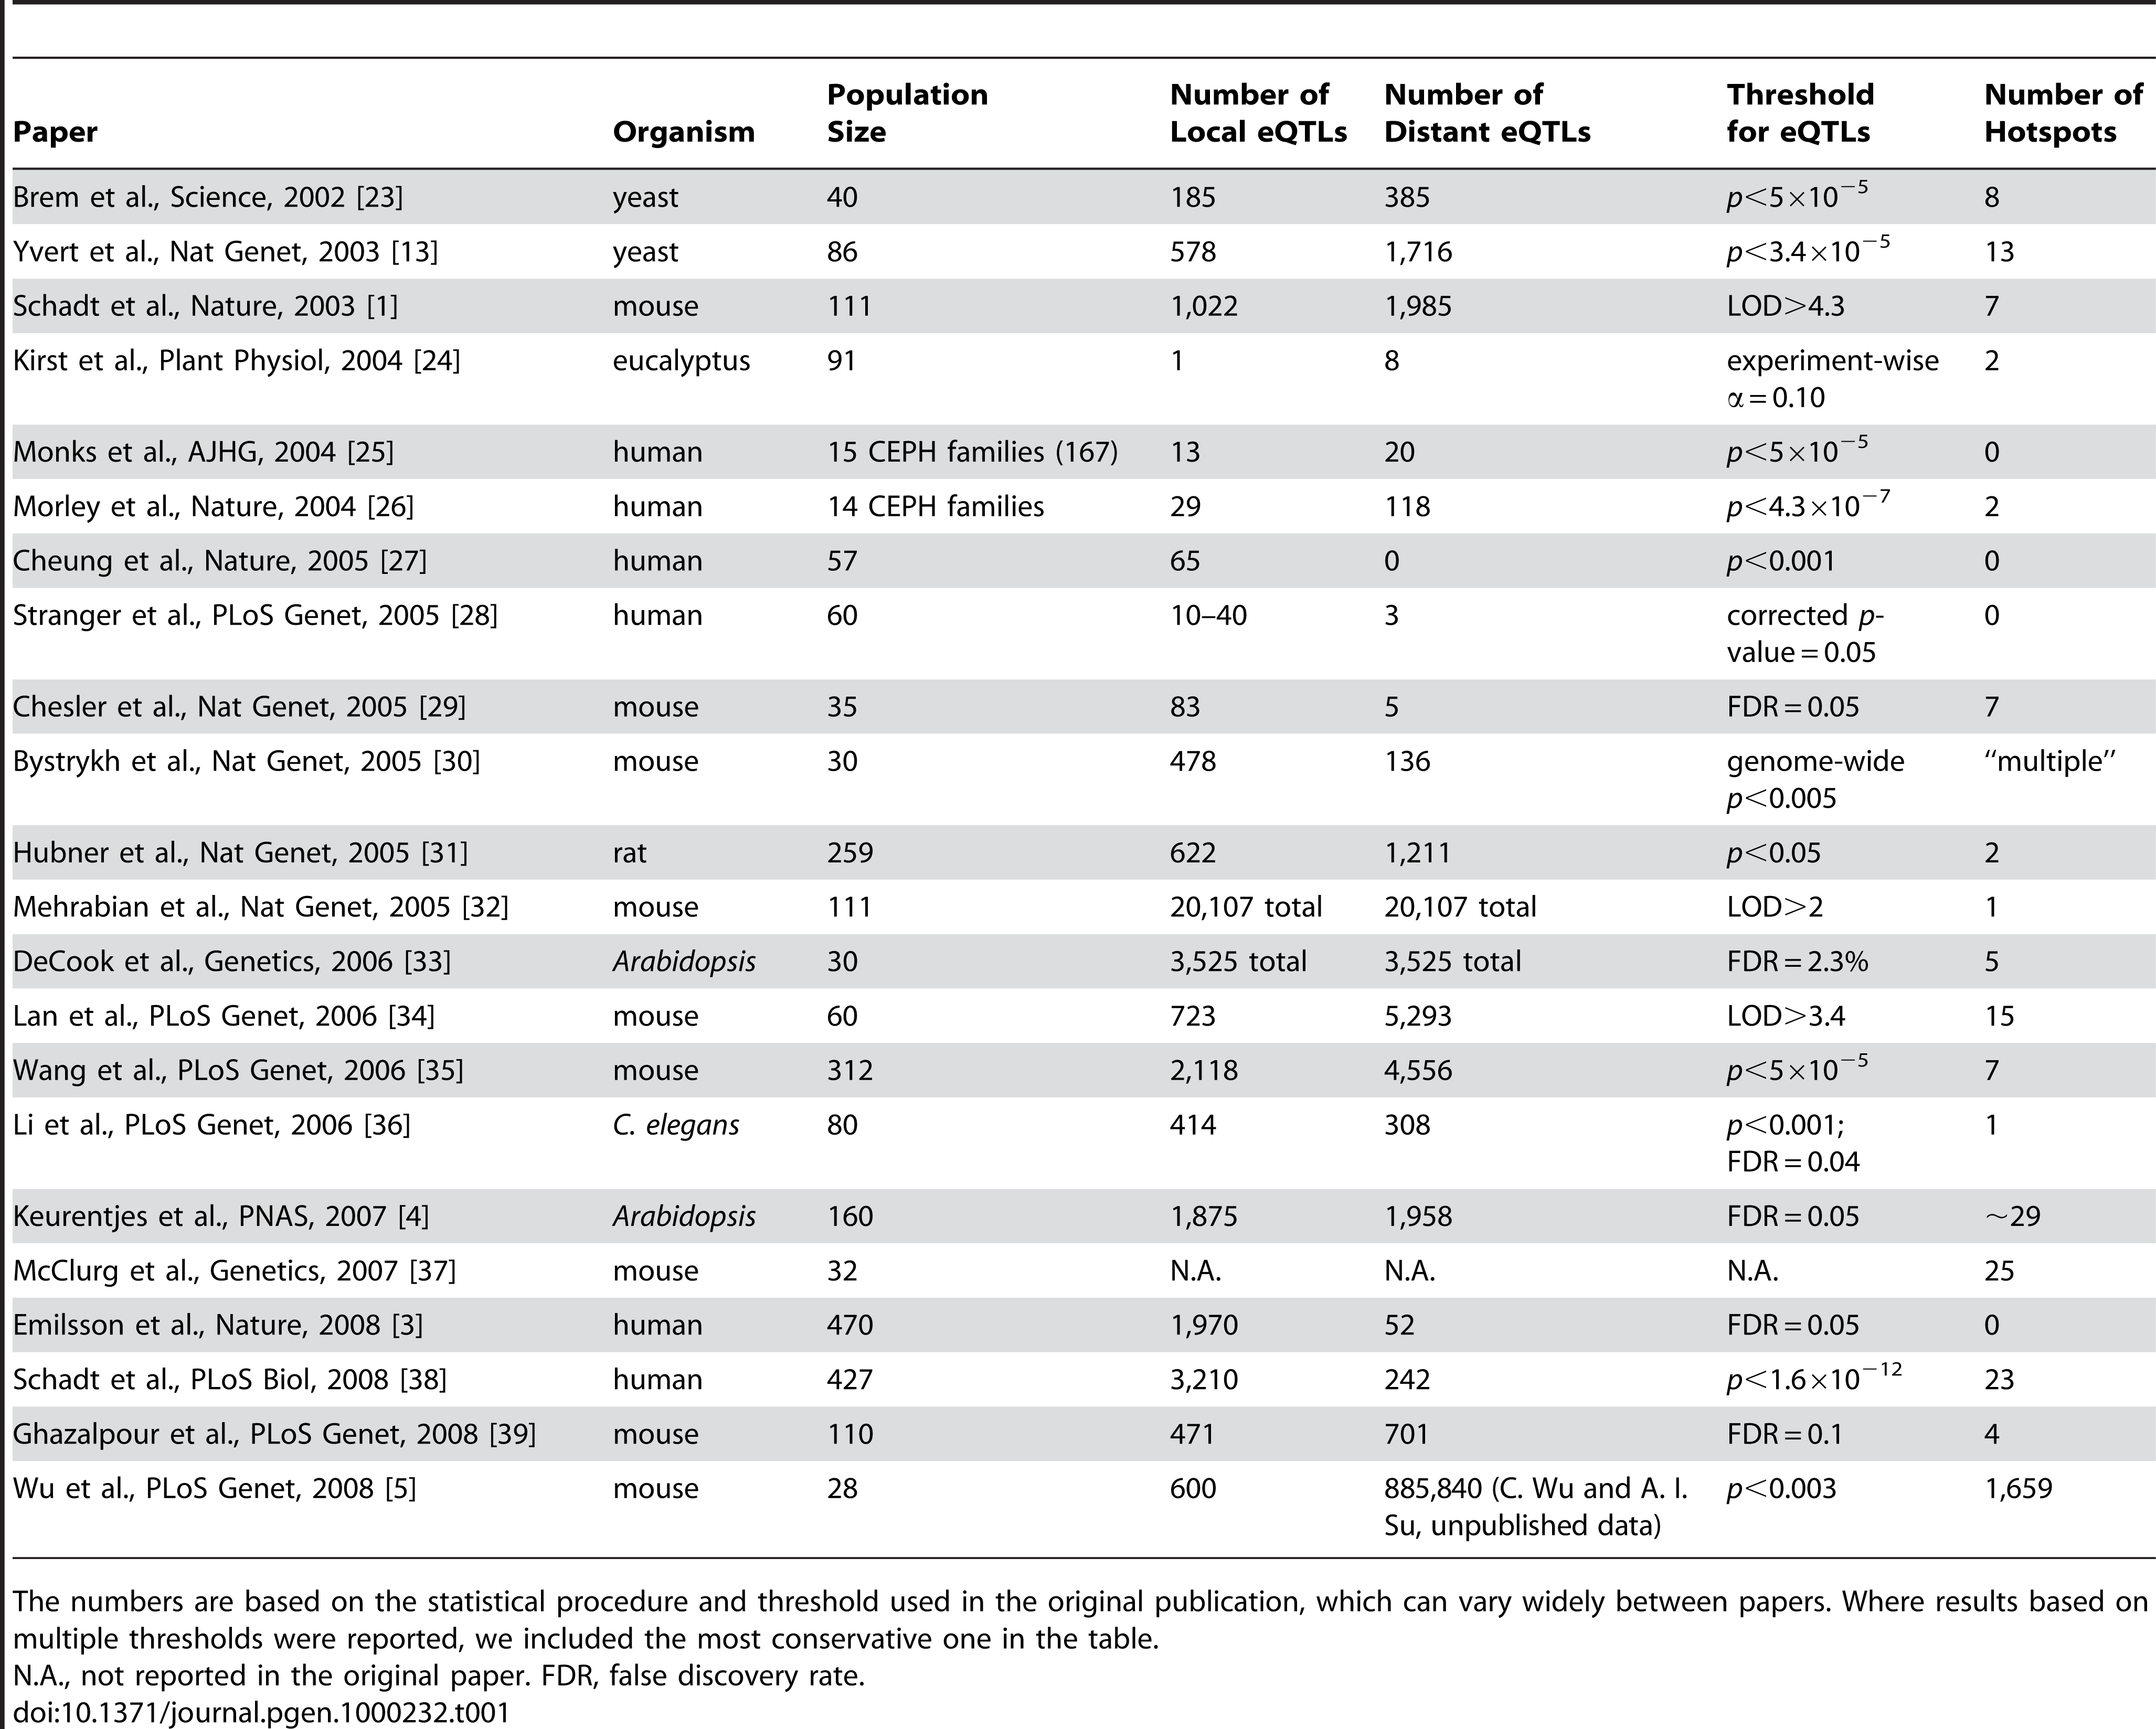 eQTL Hotspots Reported in Selected Genetical Genomics Studies.